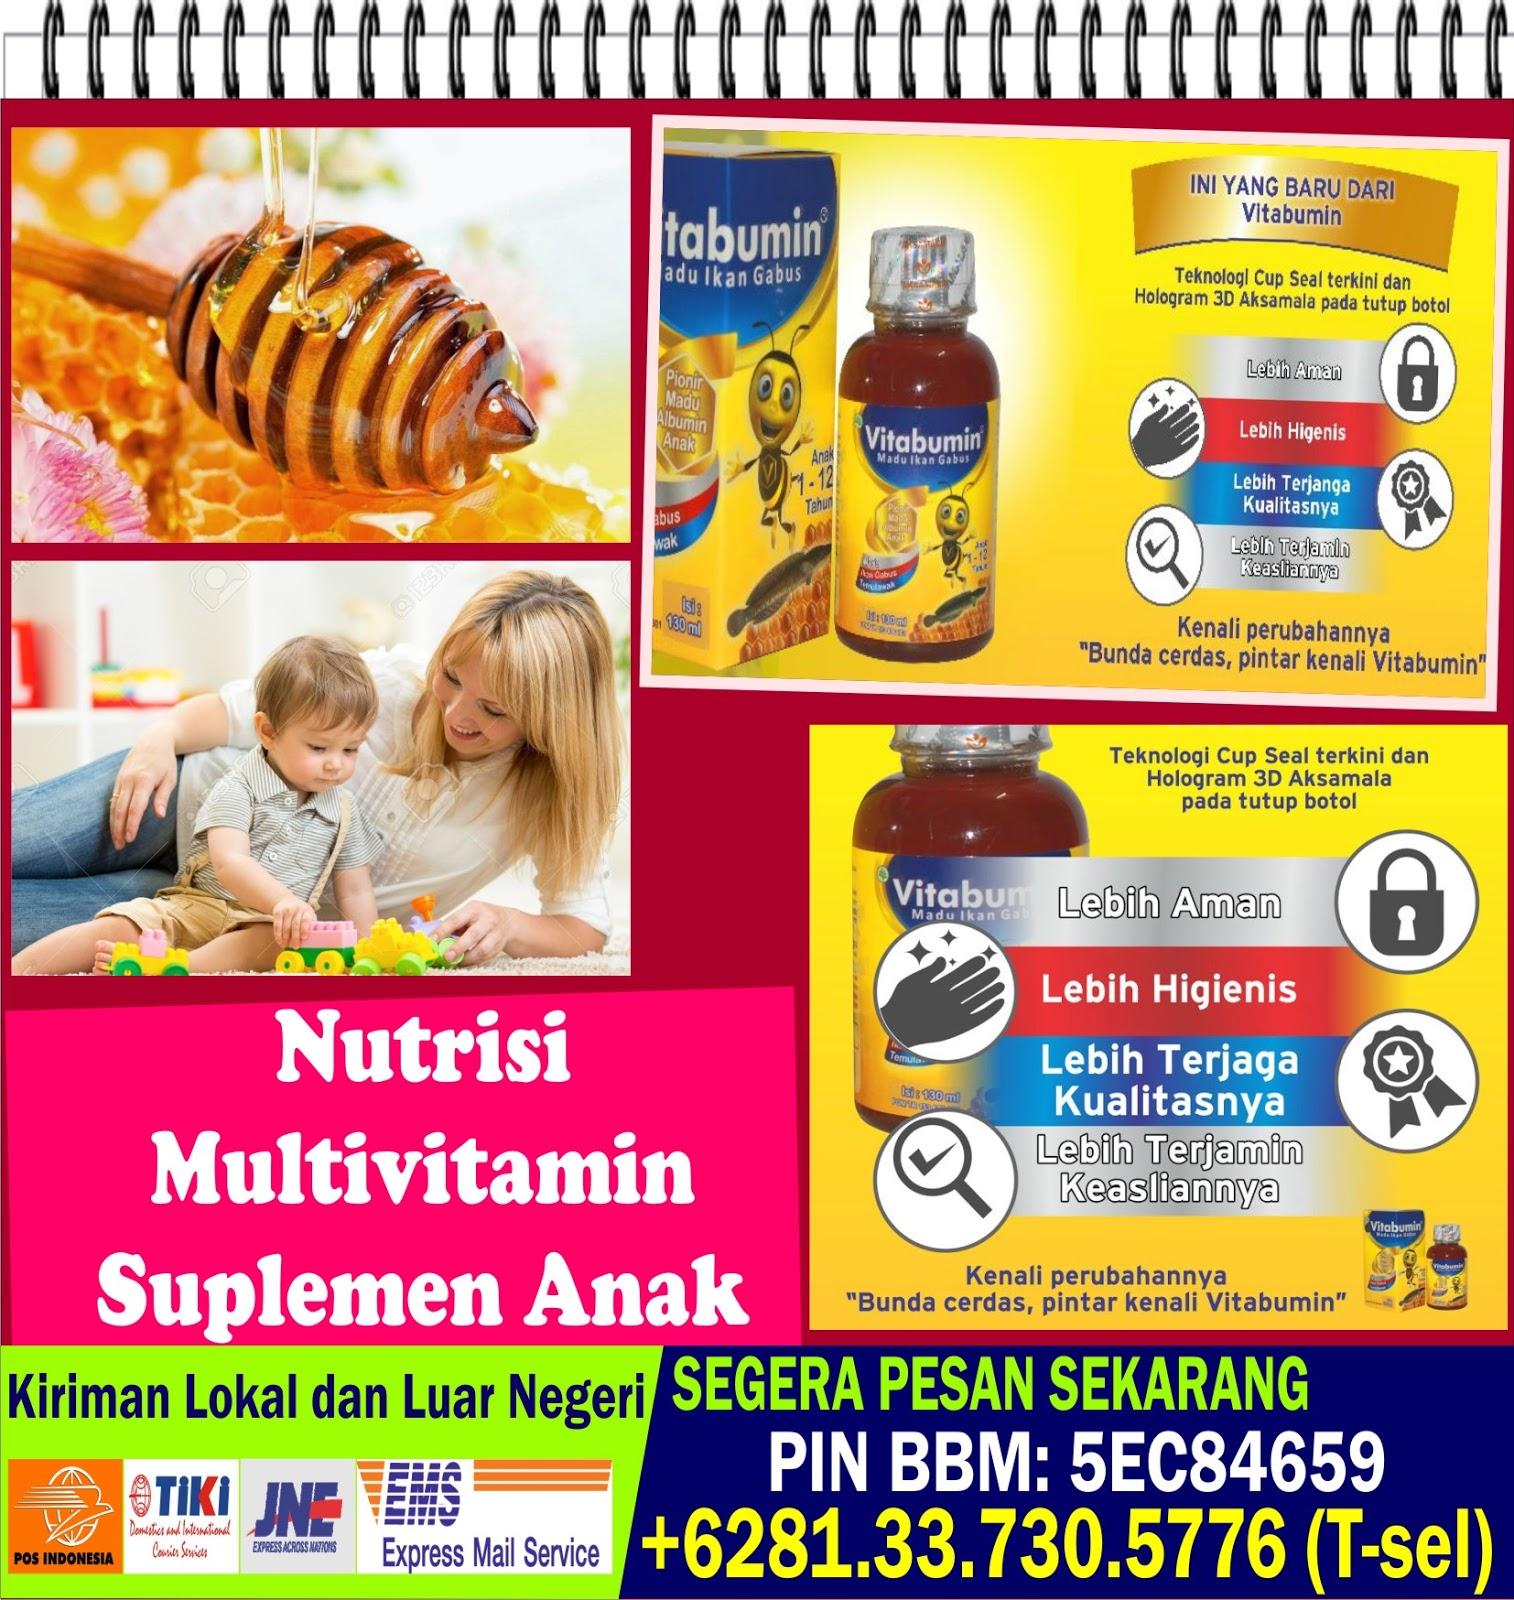 Mencukupi Nutrisi Anak Usia 1 Tahun